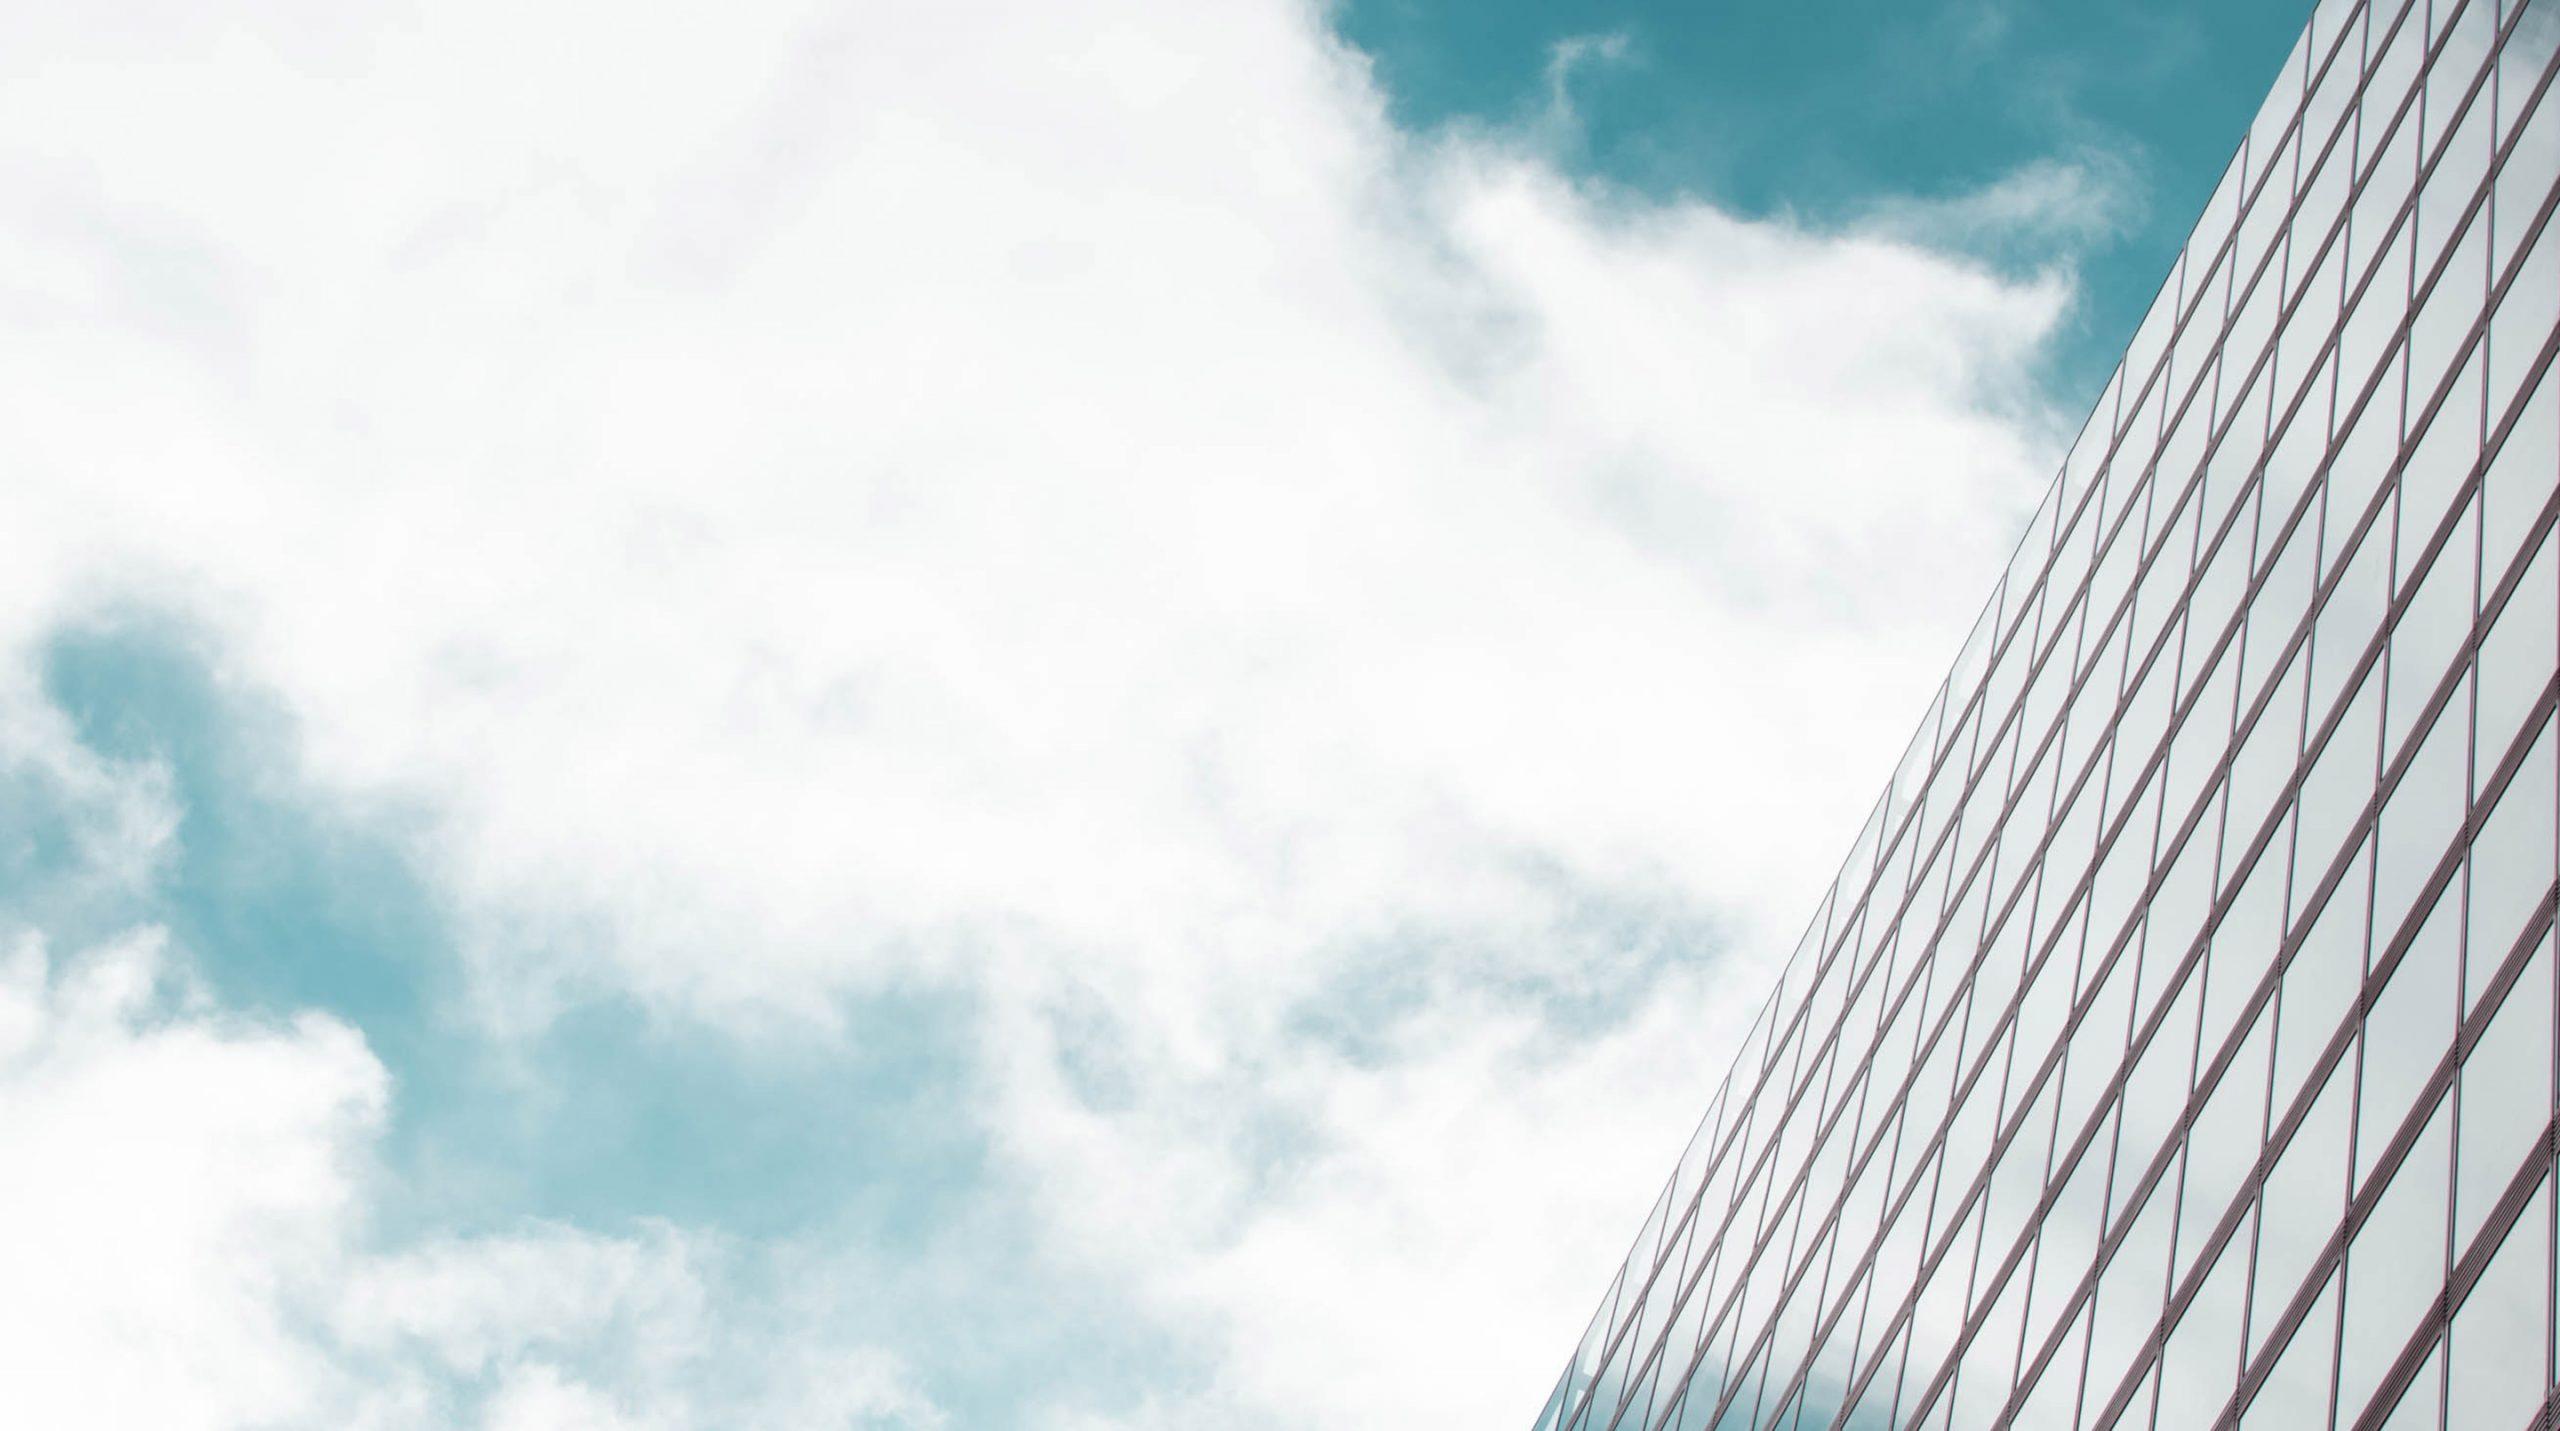 Bridging the Value Chasm - Unlocking Cloud Capabilities and Adoption